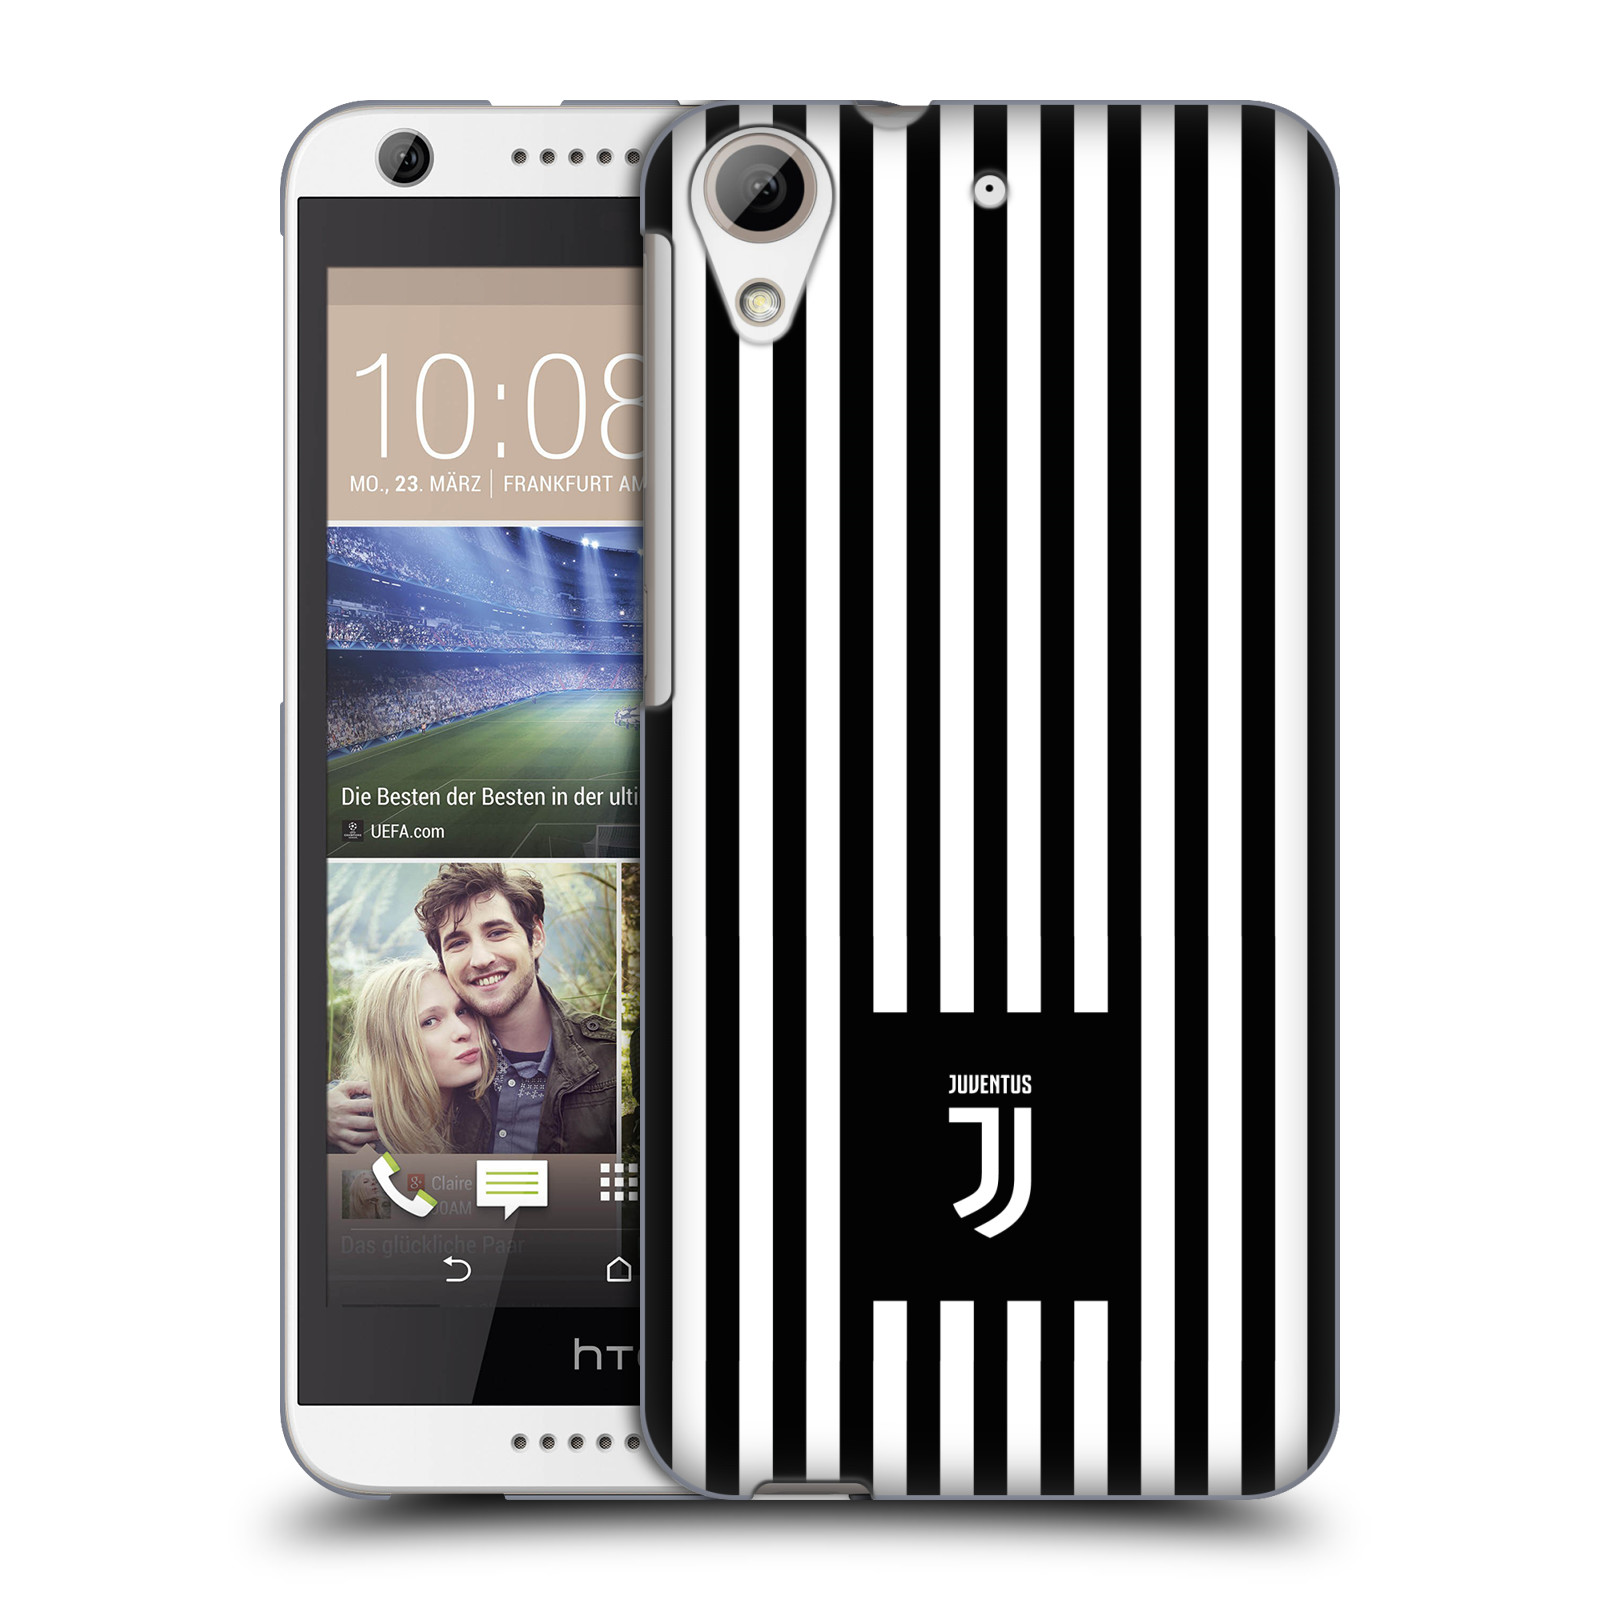 Plastové pouzdro na mobil HTC Desire 626 / 626G - Head Case - Juventus FC - Nové logo - Pruhy